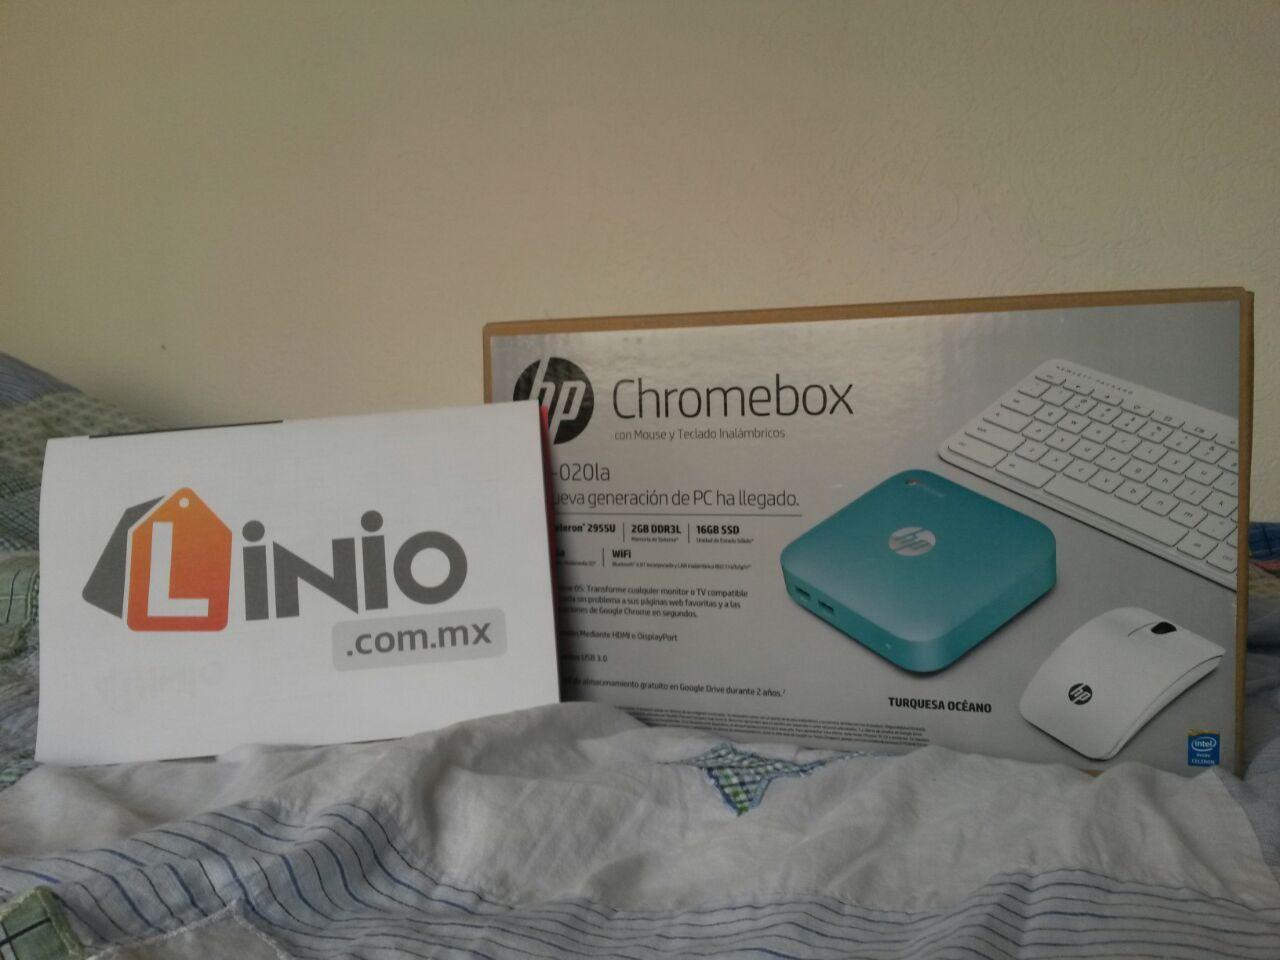 Linio: PC HP Chromebox + Kit teclado y Mouse inalambricos a $1,499 o menos